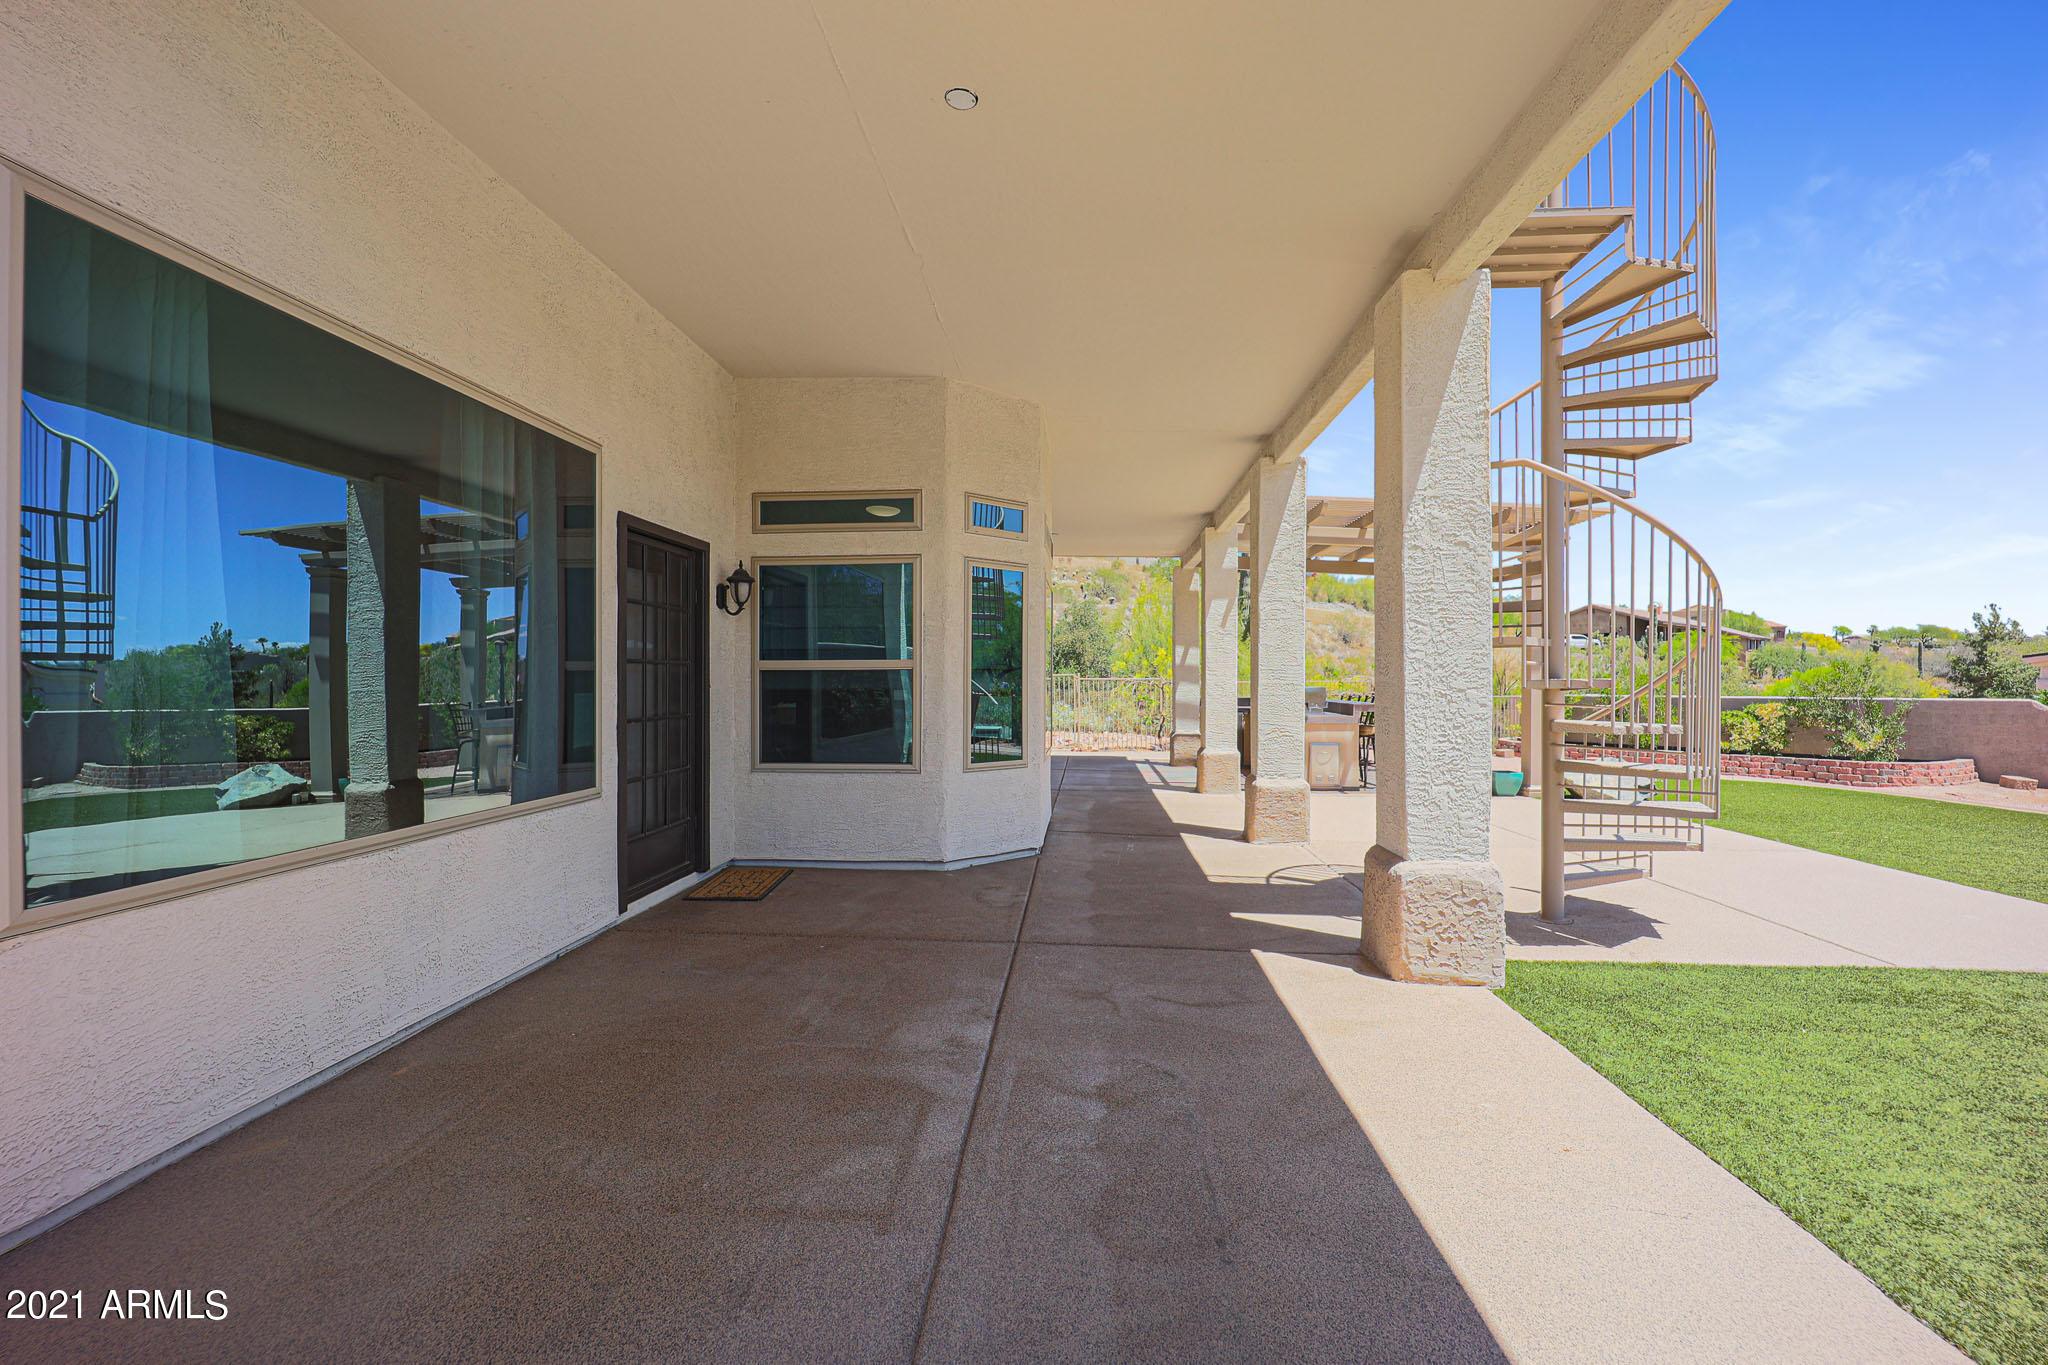 MLS 6230230 15008 E GREENE VALLEY Drive, Fountain Hills, AZ 85268 Fountain Hills AZ Eco-Friendly